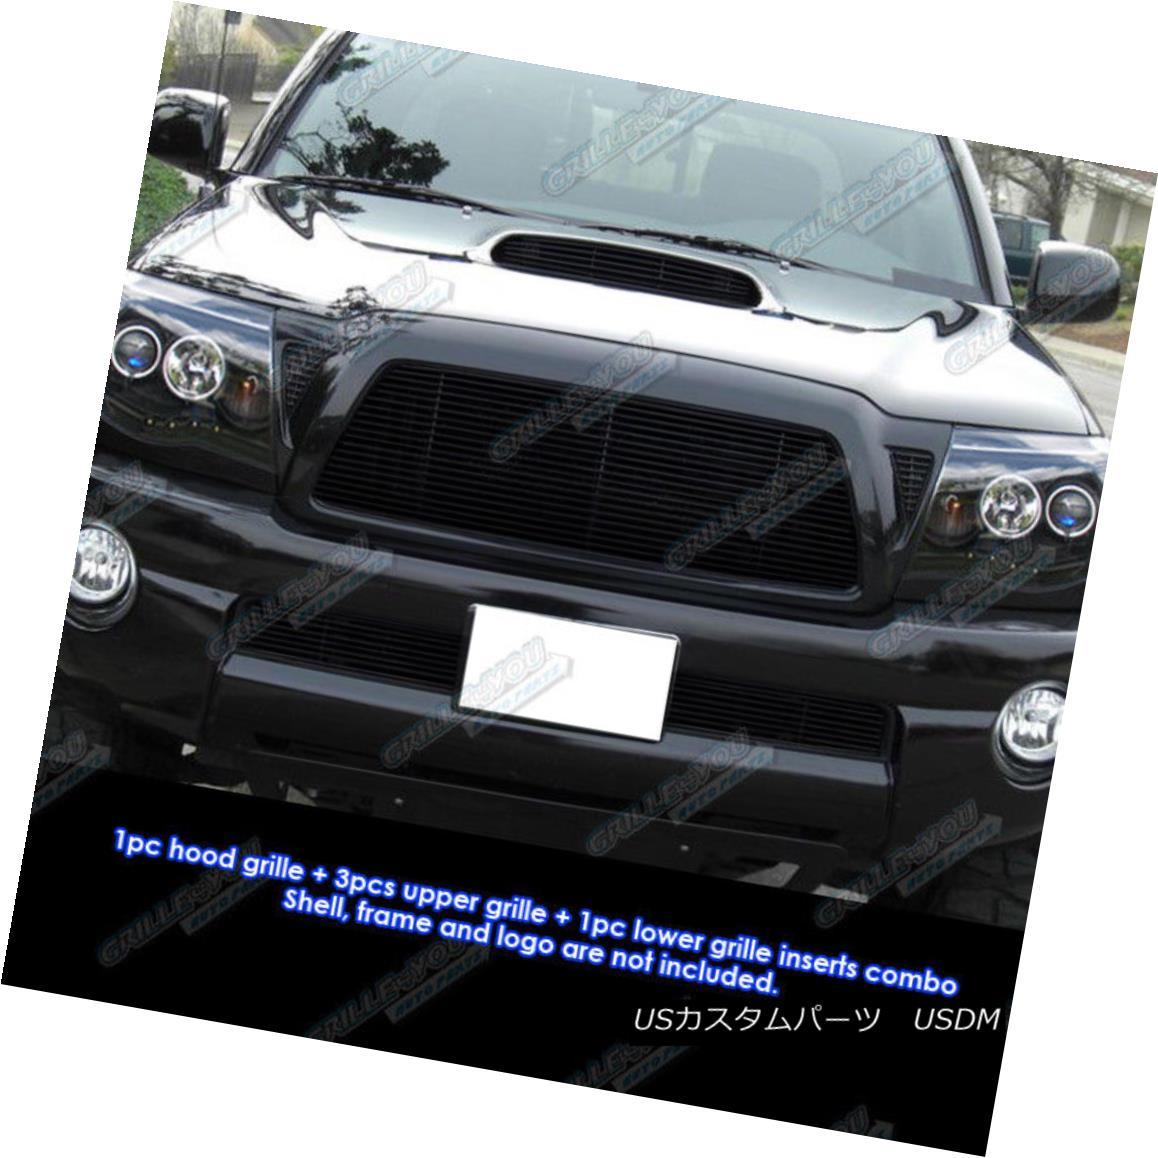 USグリル Custom Fits 05-10 Toyota Tacoma TRD Sport Black Billet Grill Combo カスタムフィッティング05-10トヨタタコマTRDスポーツブラックビレットグリルコンボ